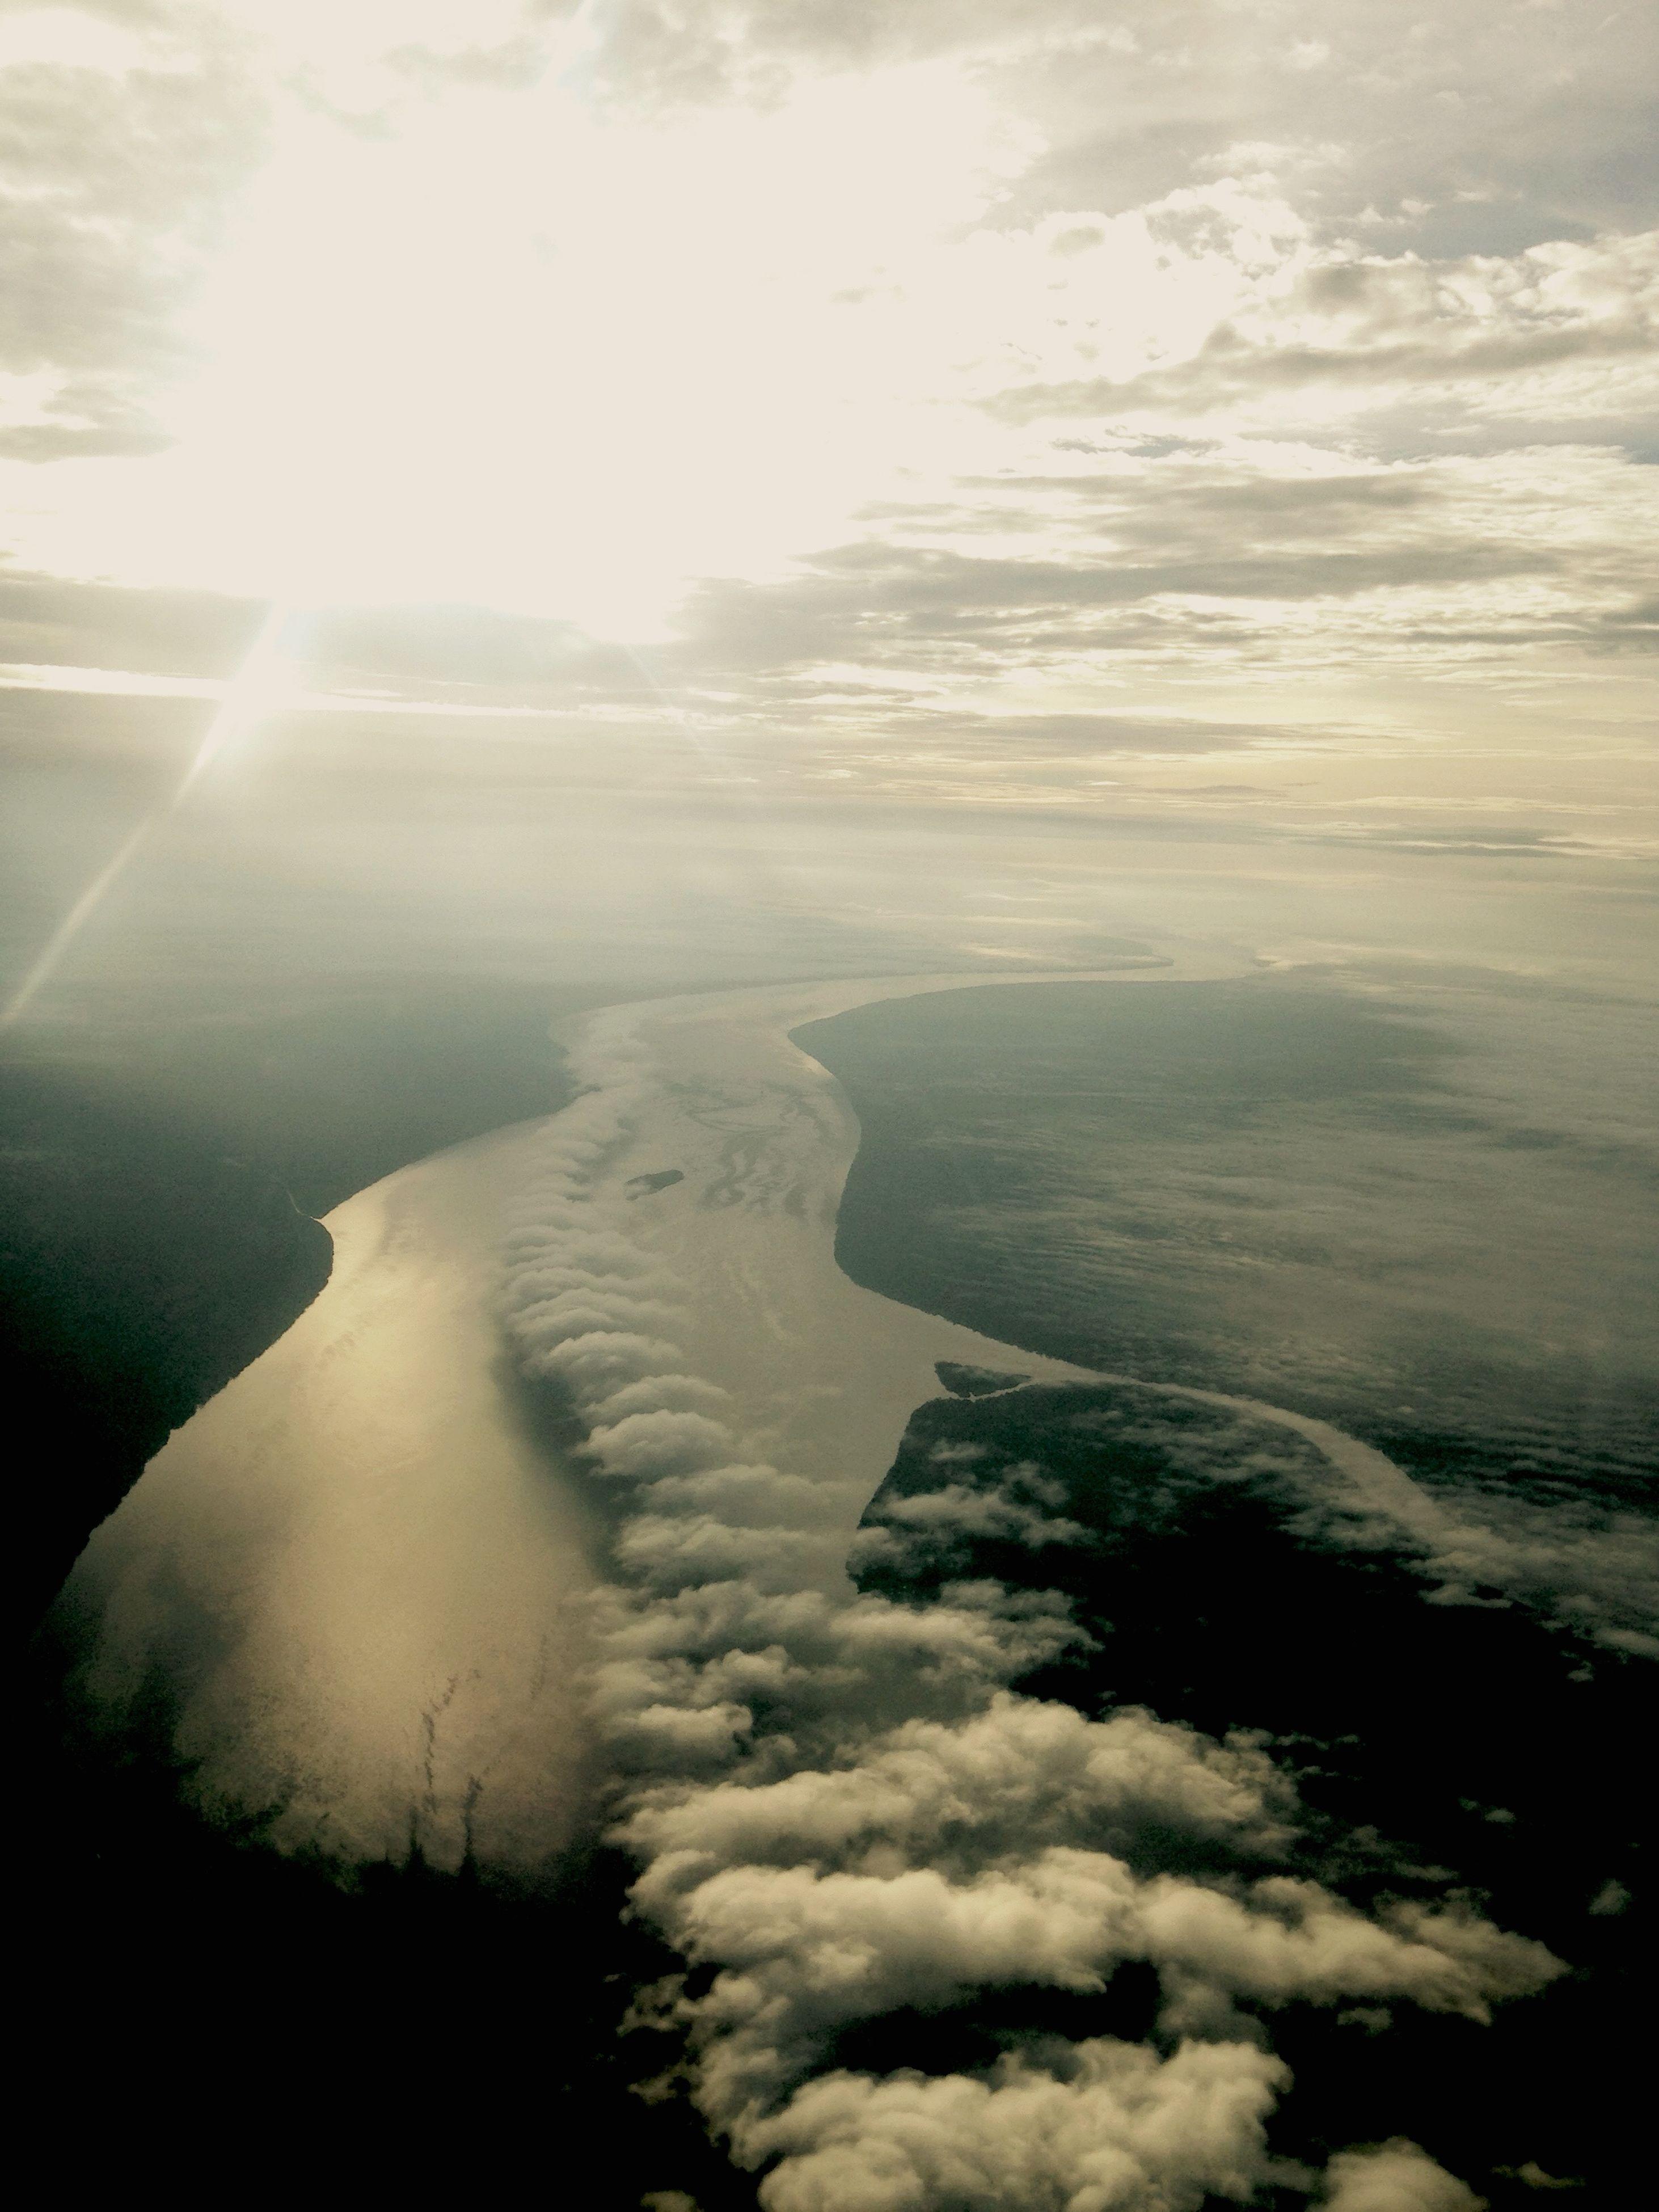 sun, scenics, sunbeam, tranquil scene, tranquility, beauty in nature, sky, sunlight, nature, landscape, lens flare, aerial view, mountain, cloud - sky, idyllic, mountain range, day, non-urban scene, outdoors, cloud